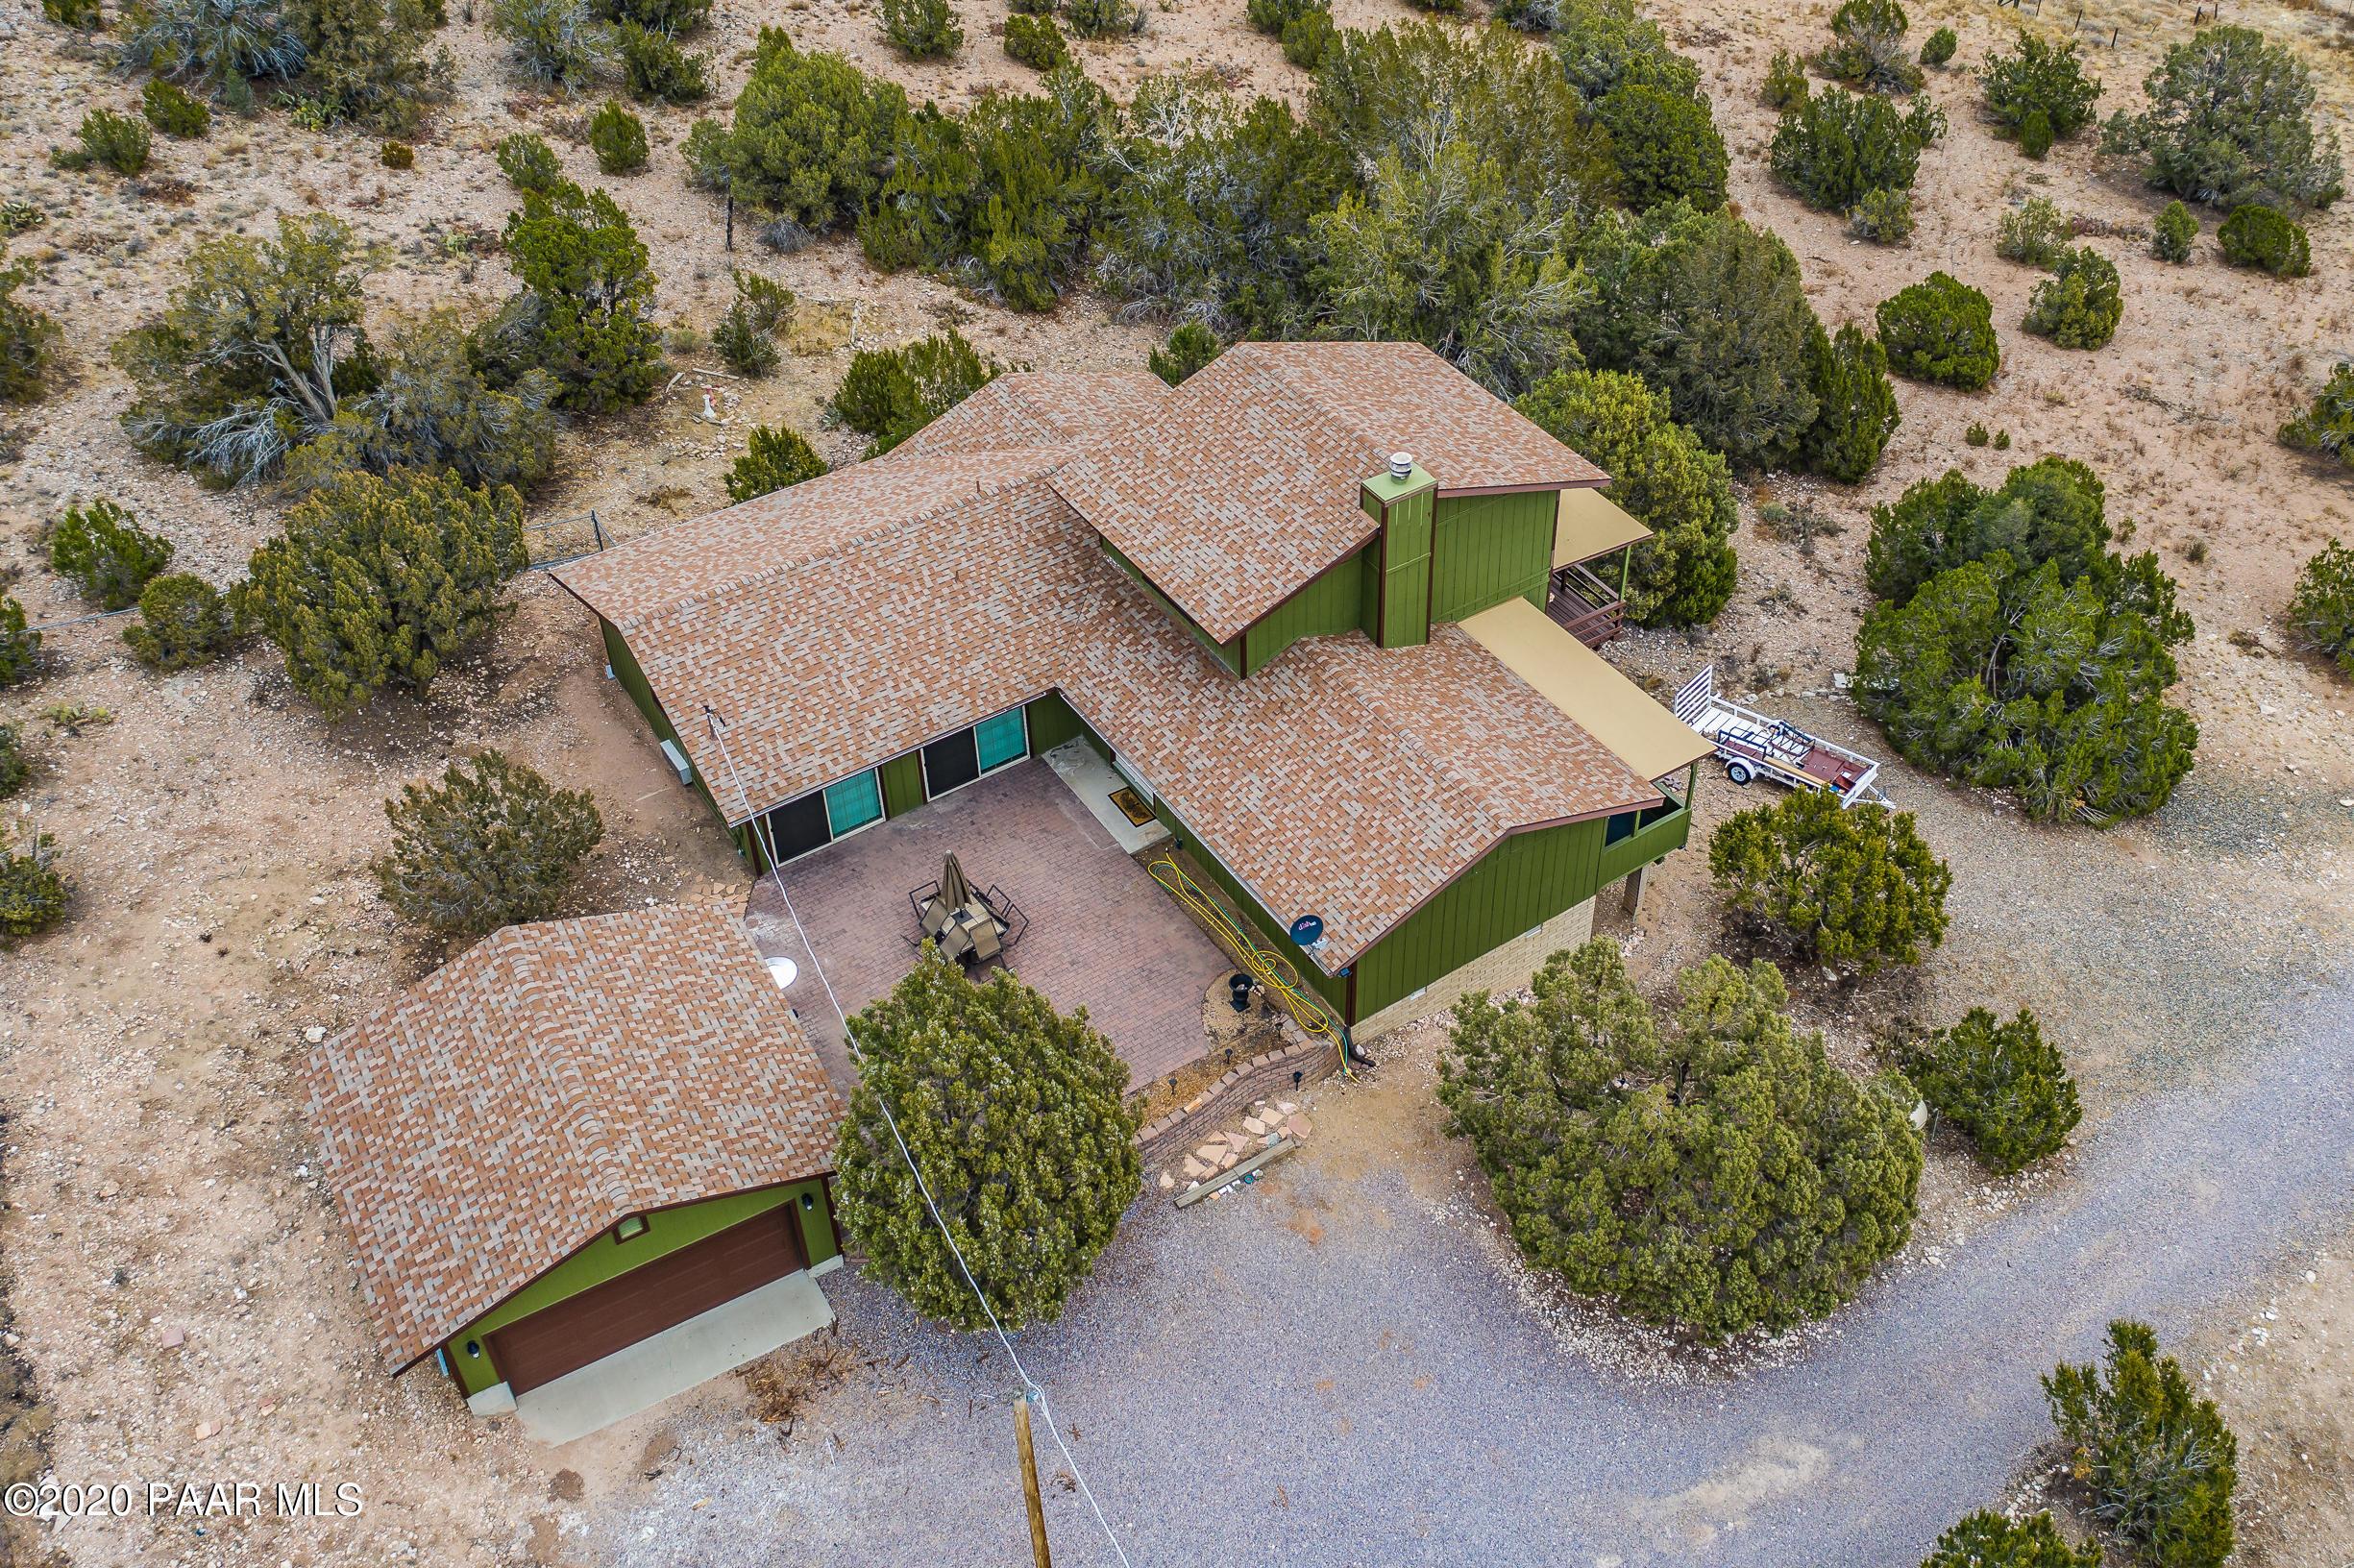 Photo of 4020 Yuma, Chino Valley, AZ 86323